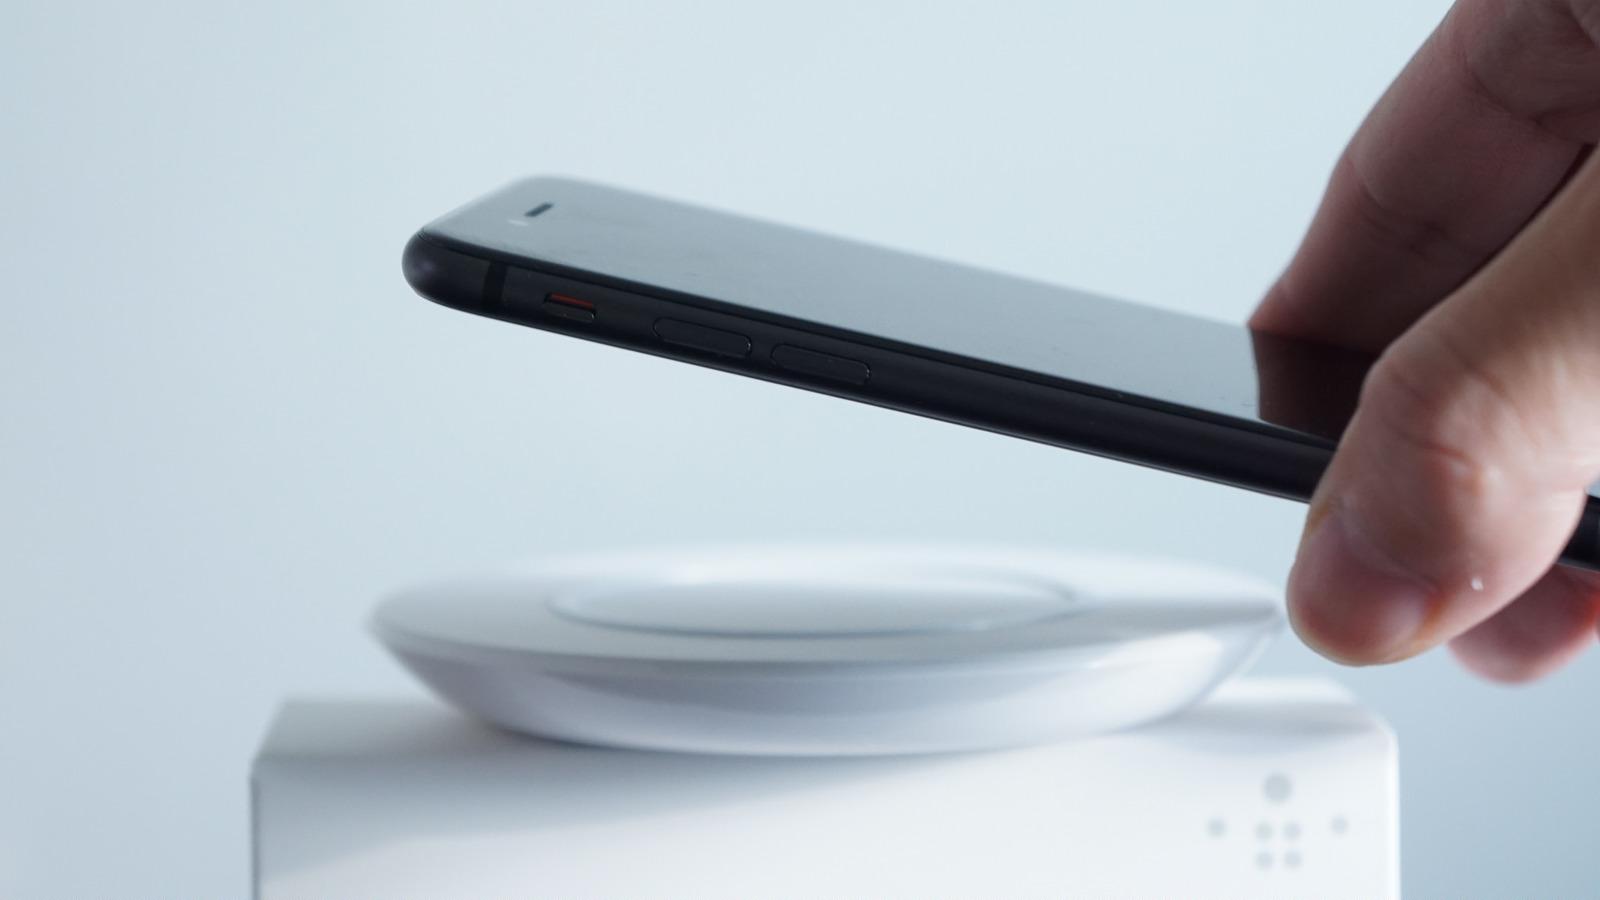 iPhoneの高速ワイヤレス充電、充電時間が1時間30分短縮でケーブル充電並みに